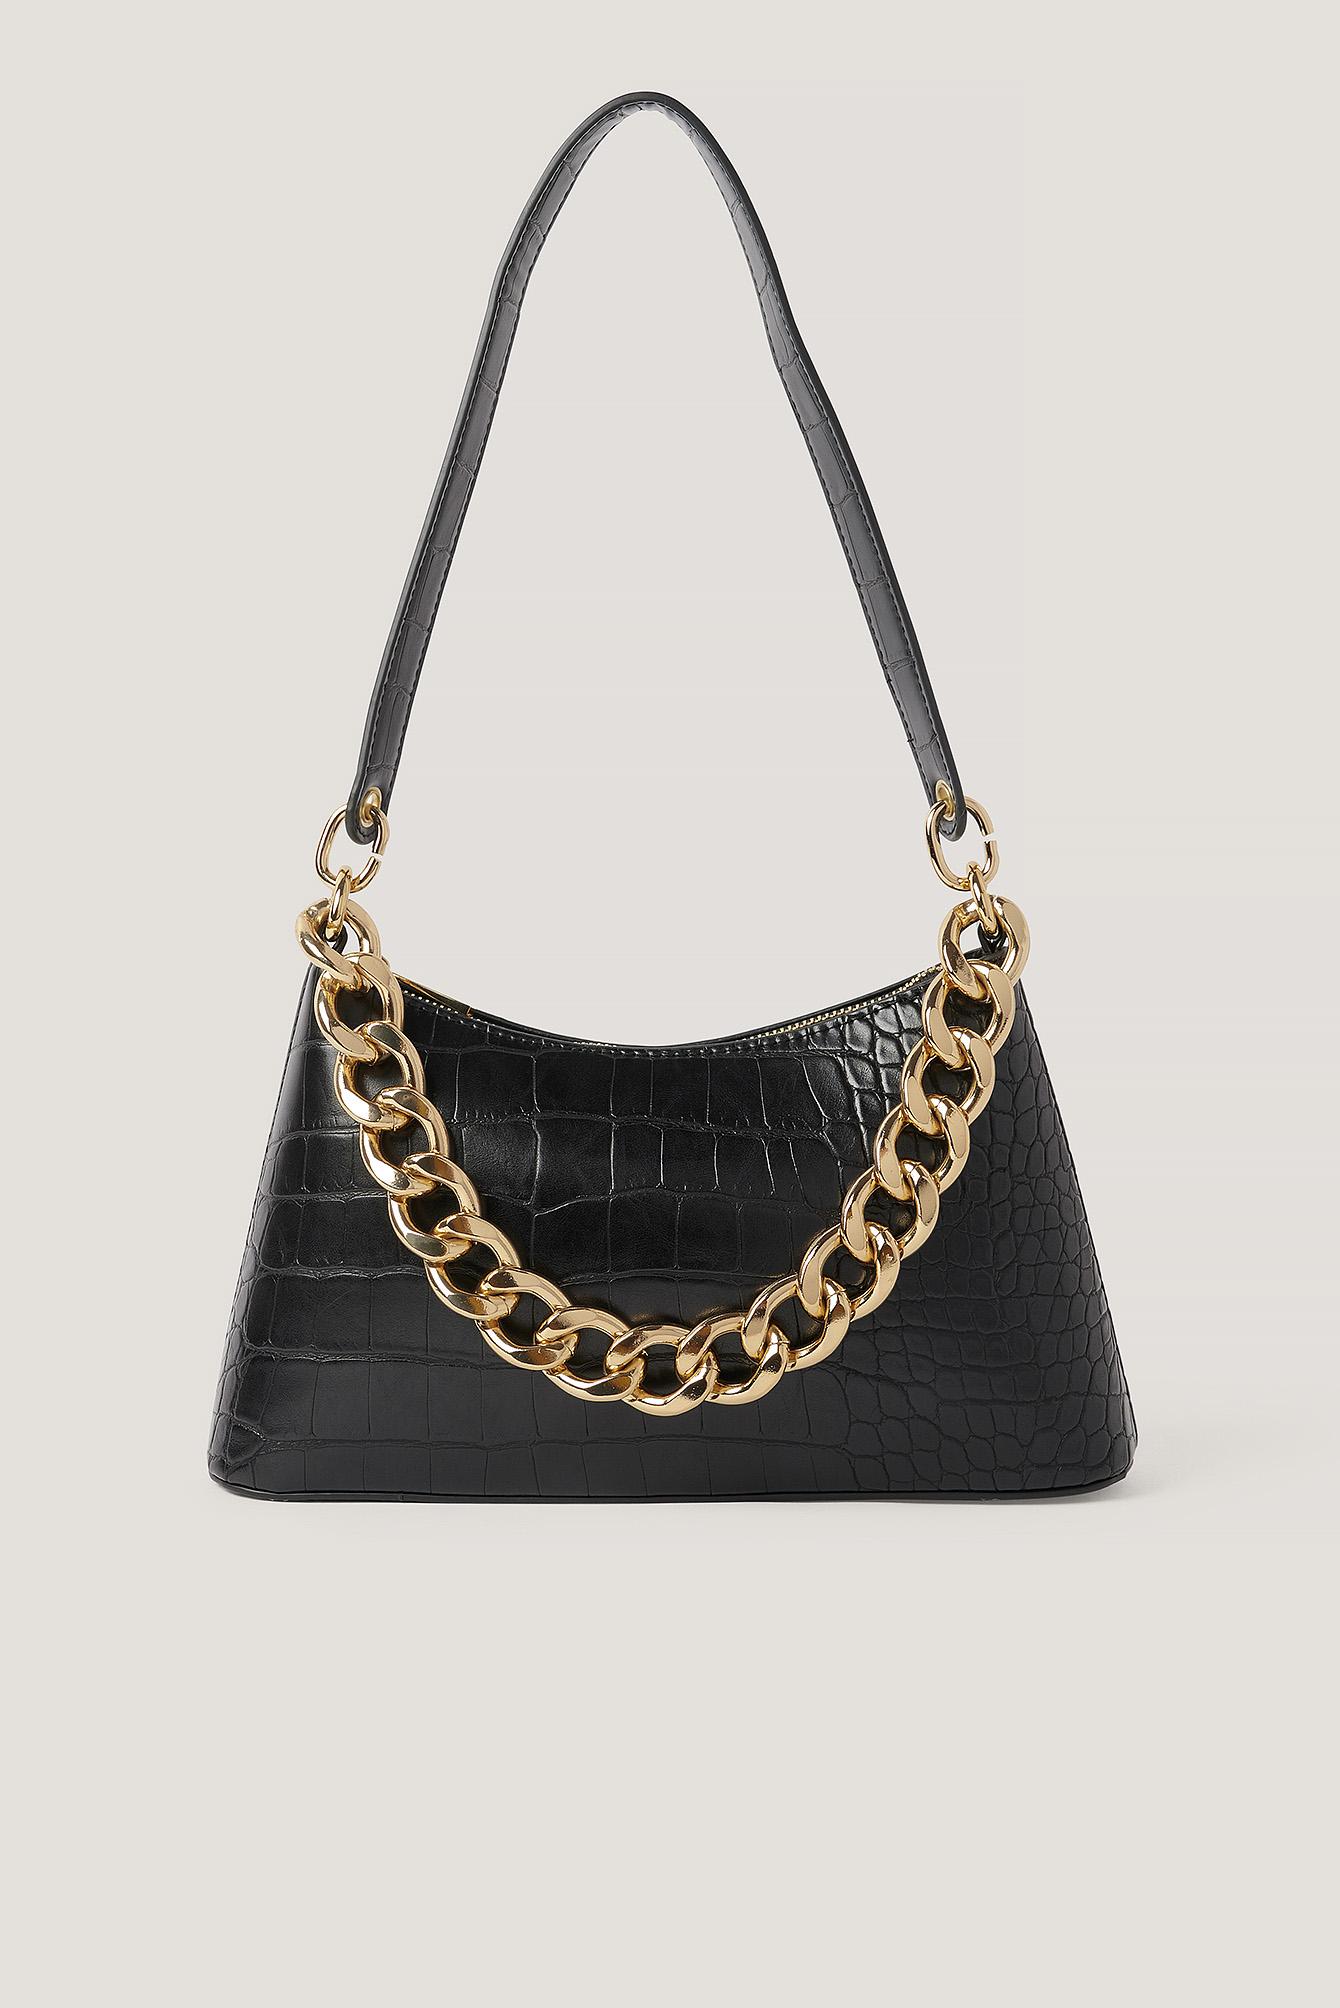 na-kd accessories -  Klobige Kette Baguette-Tasche - Black